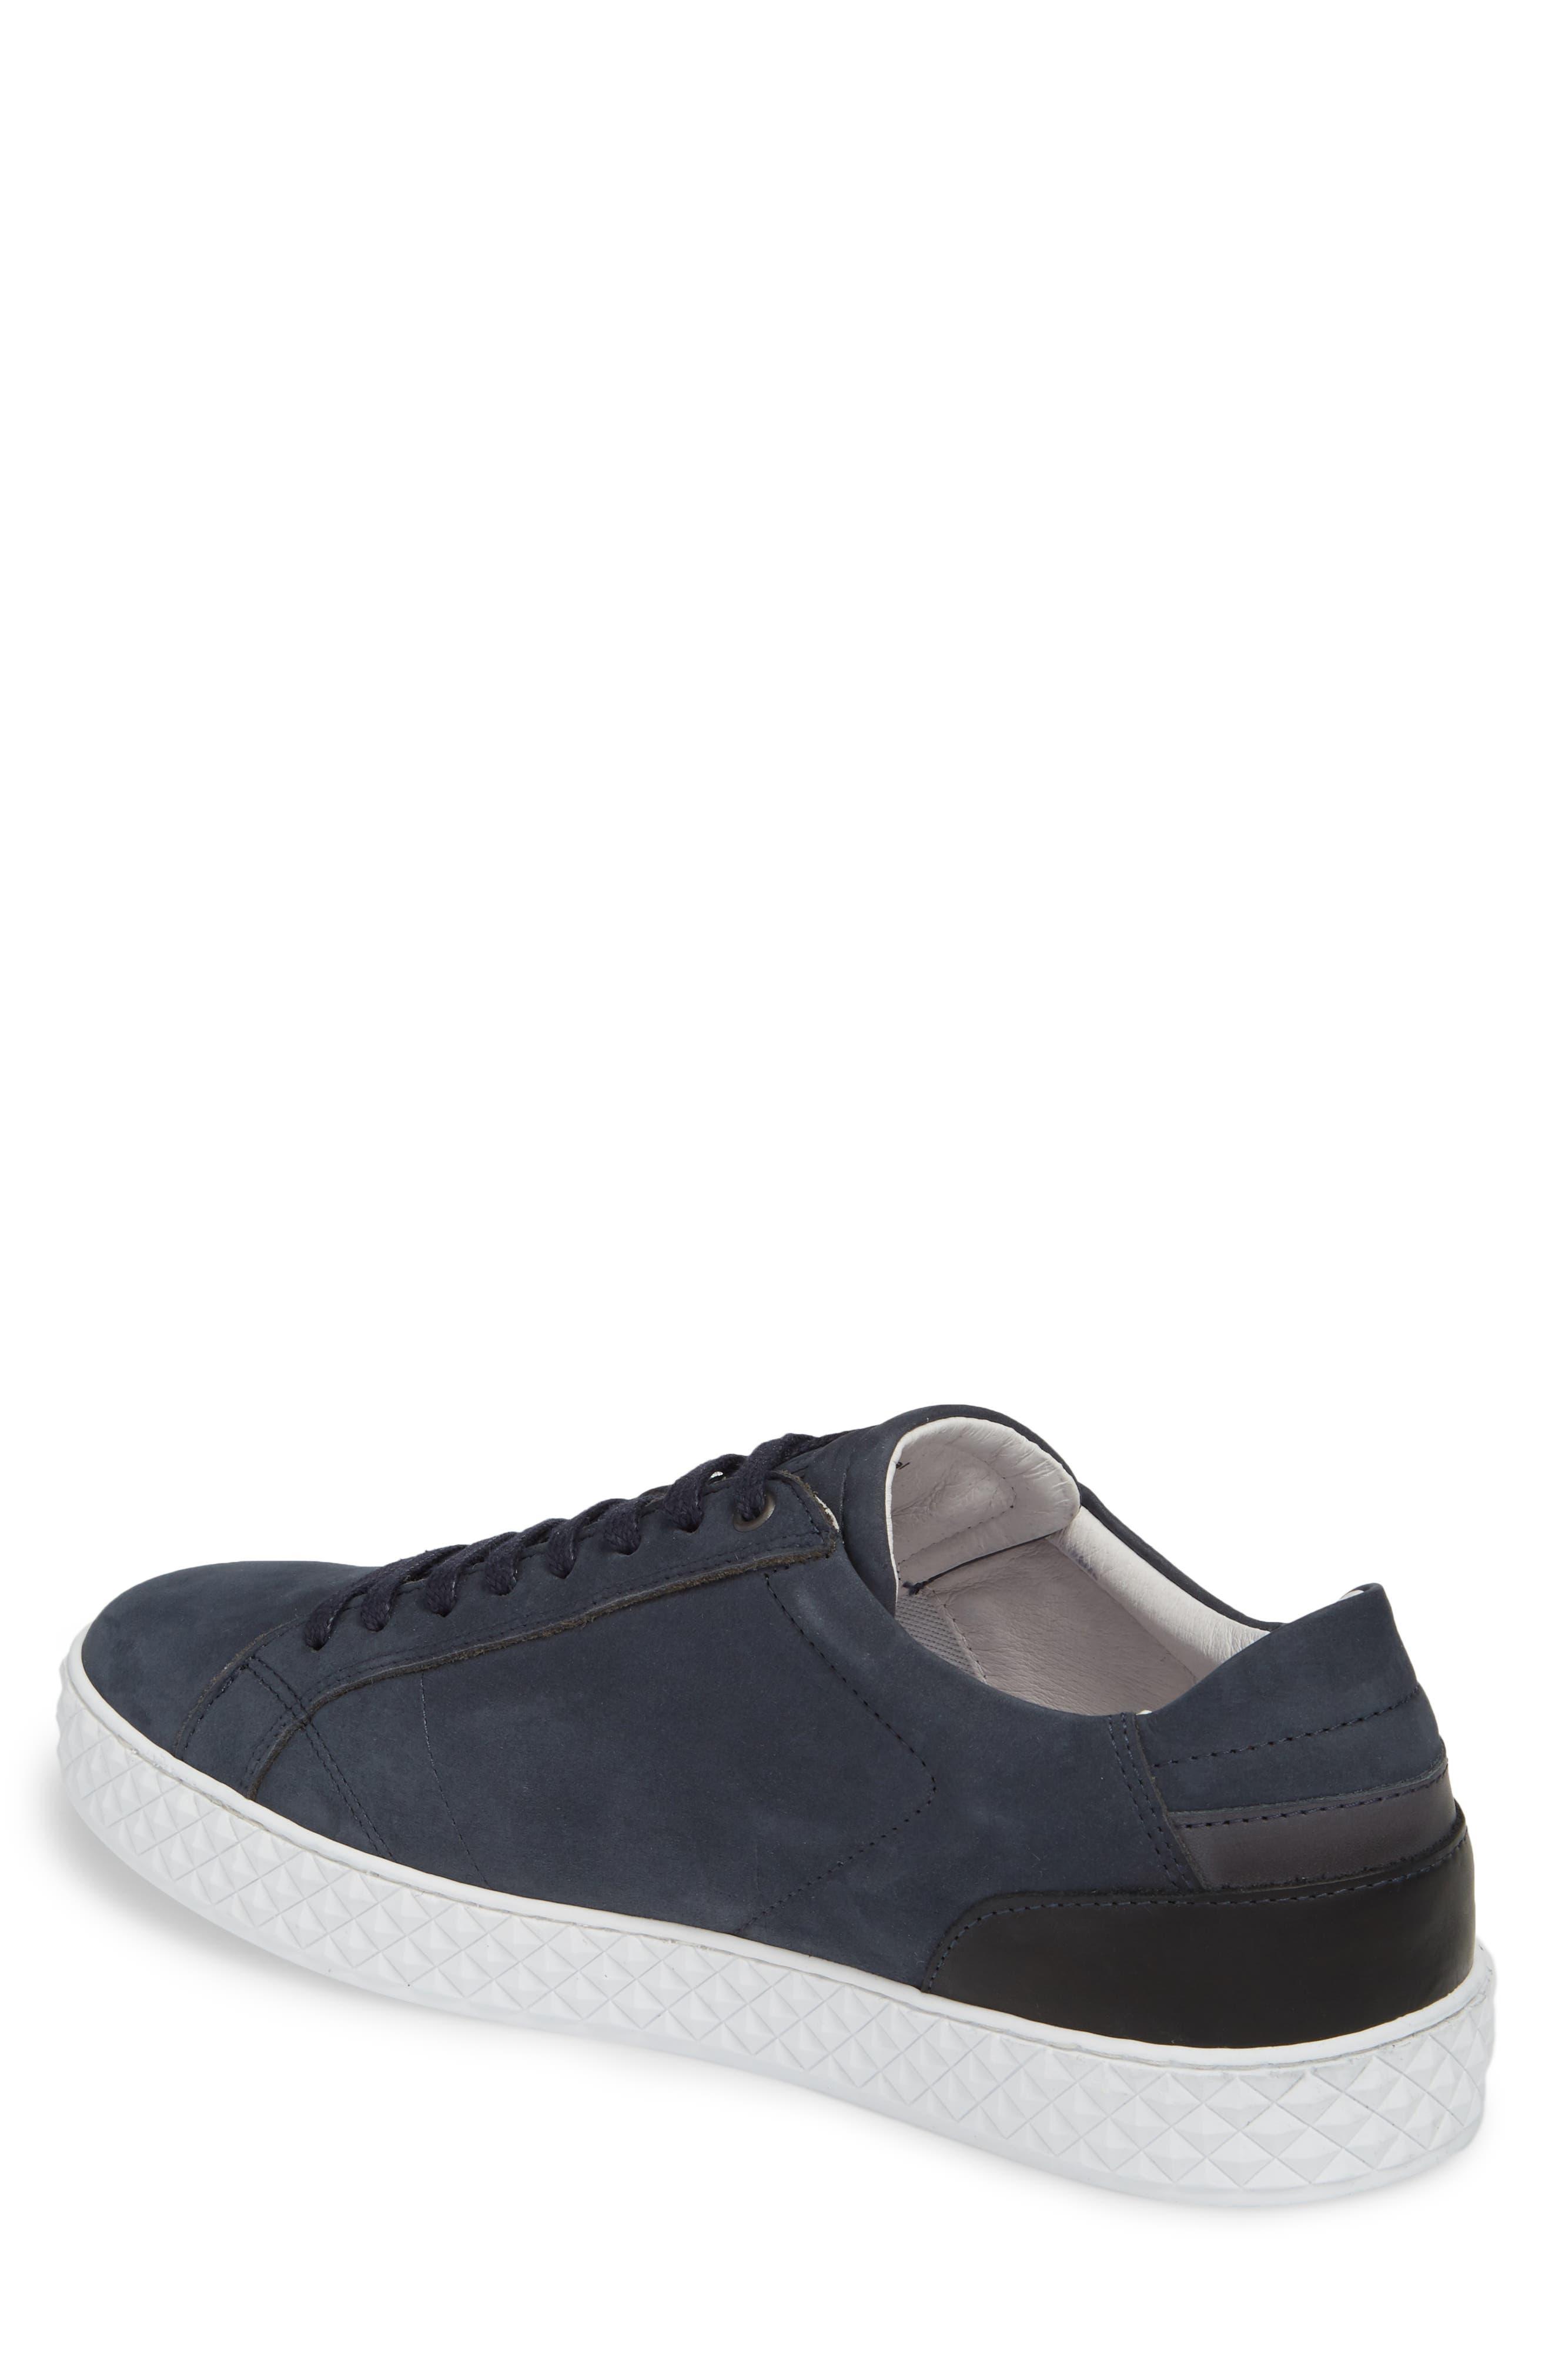 Bratislava Low Top Sneaker,                             Alternate thumbnail 2, color,                             Navy Leather